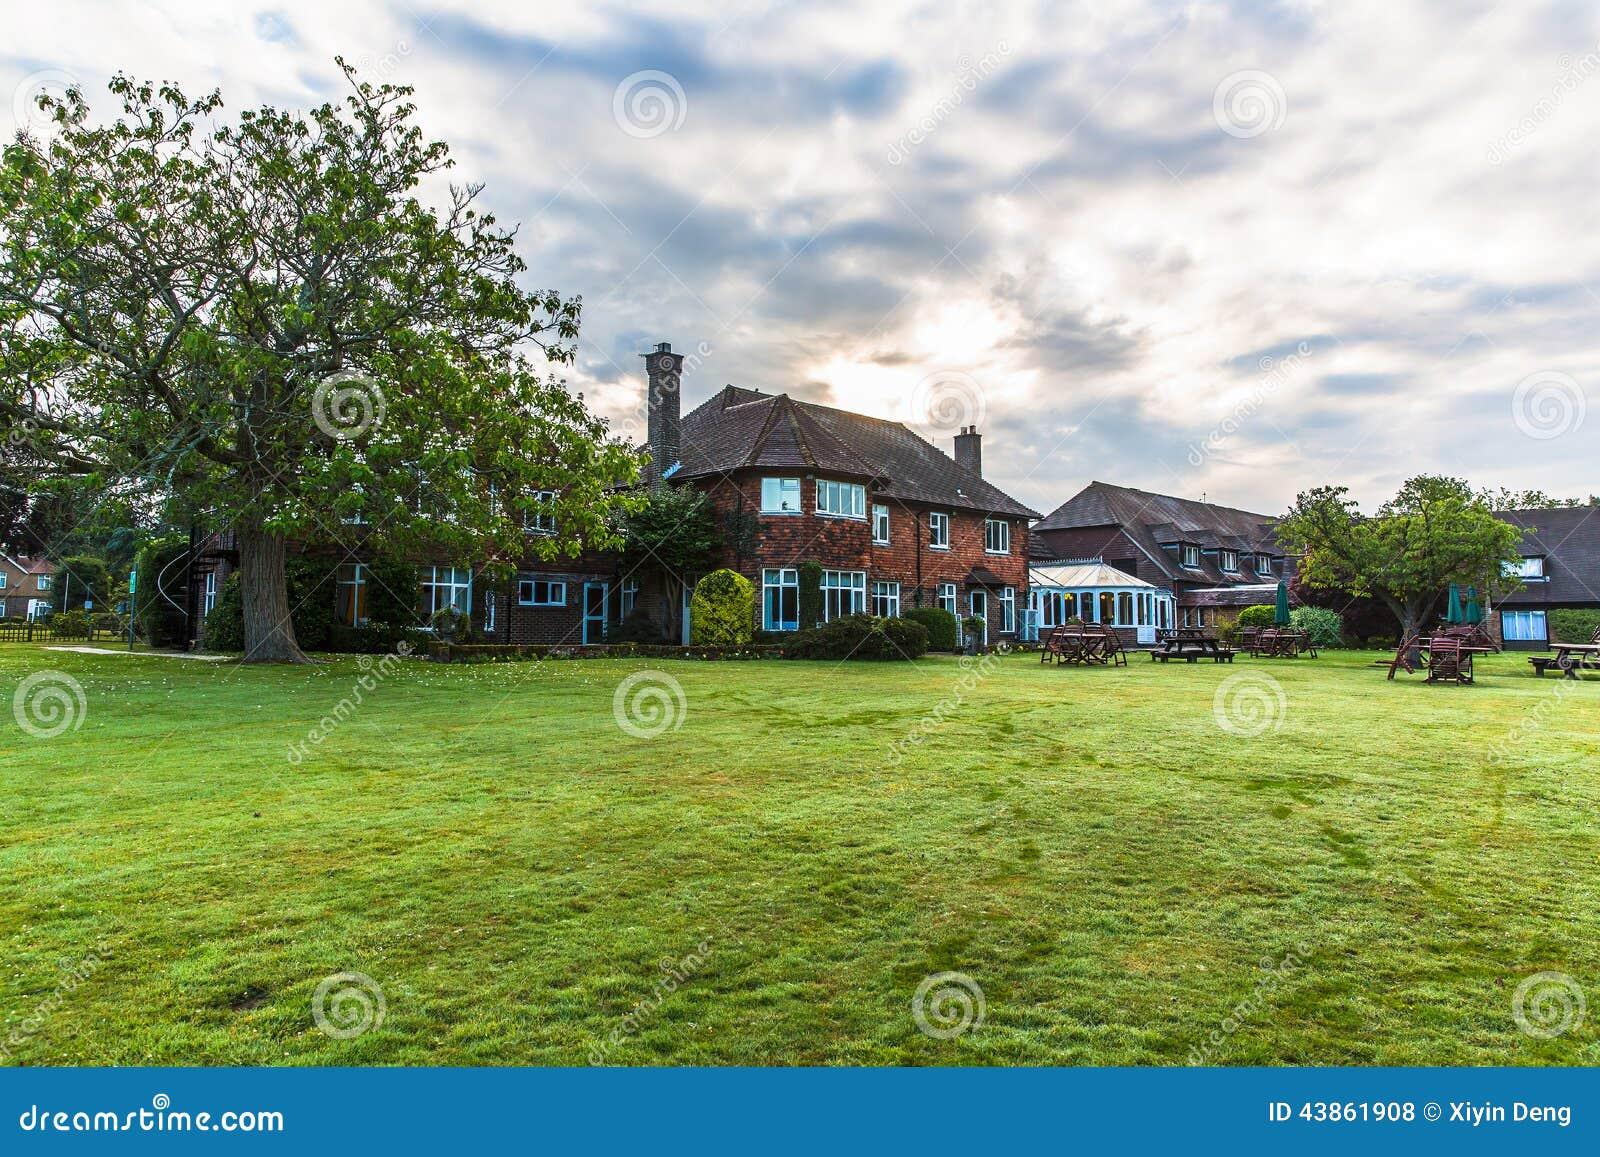 Thorne United Kingdom  city photos gallery : ... of Hotel COPTHORNE LONDON GATWICK, GATWICK , LONDON, UNITED KINGDOM